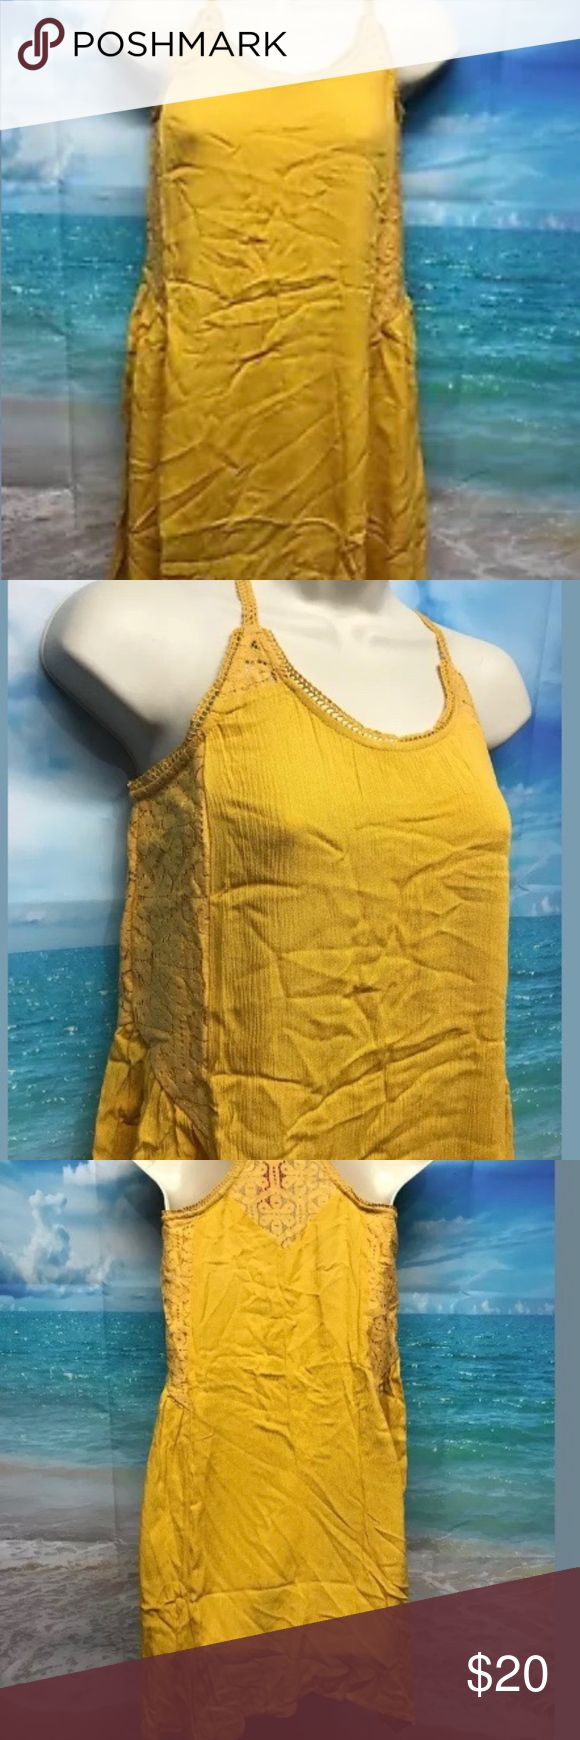 "Xhilaration Yellow Festival Dress M Spaghetti Boho Xhilaration Yellow Festival Dress M Spaghetti Boho Lace Asymmetrical NWT 982 Measurements Laying Flat:  Armpit to Armpit: 17"" Length: 35"" Waist: 19"" Hips: 27"" Xhilaration Dresses"